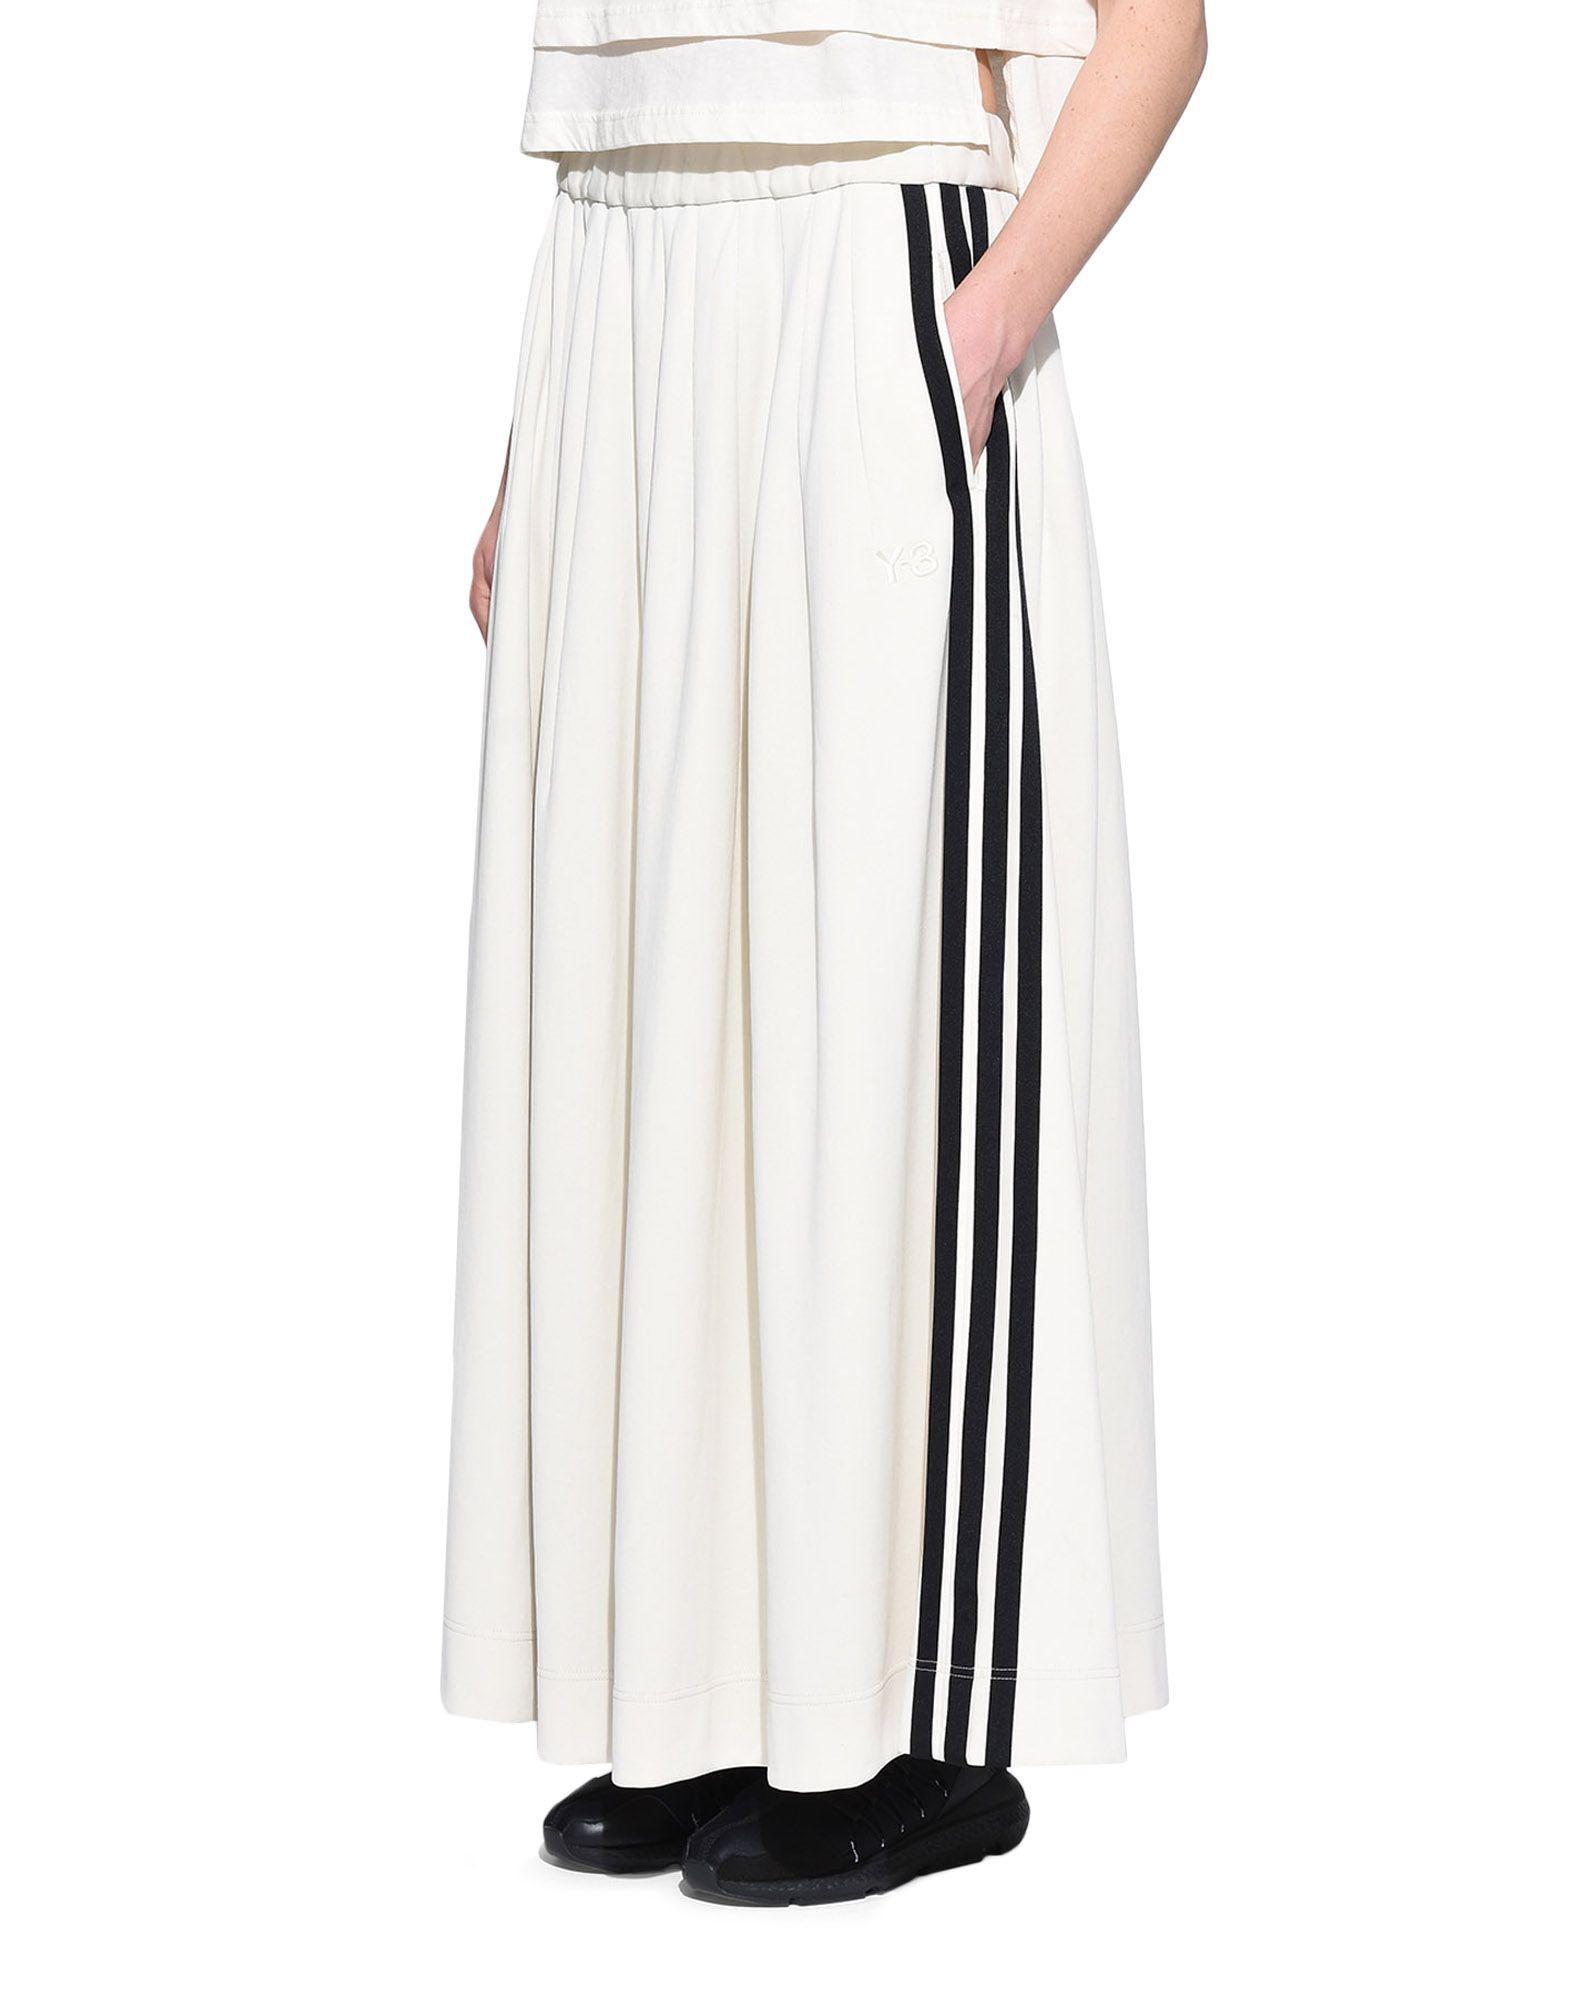 Y-3 Y-3 3-Stripes Selvedge Matte Track Skirt Gonna ginocchio Donna e